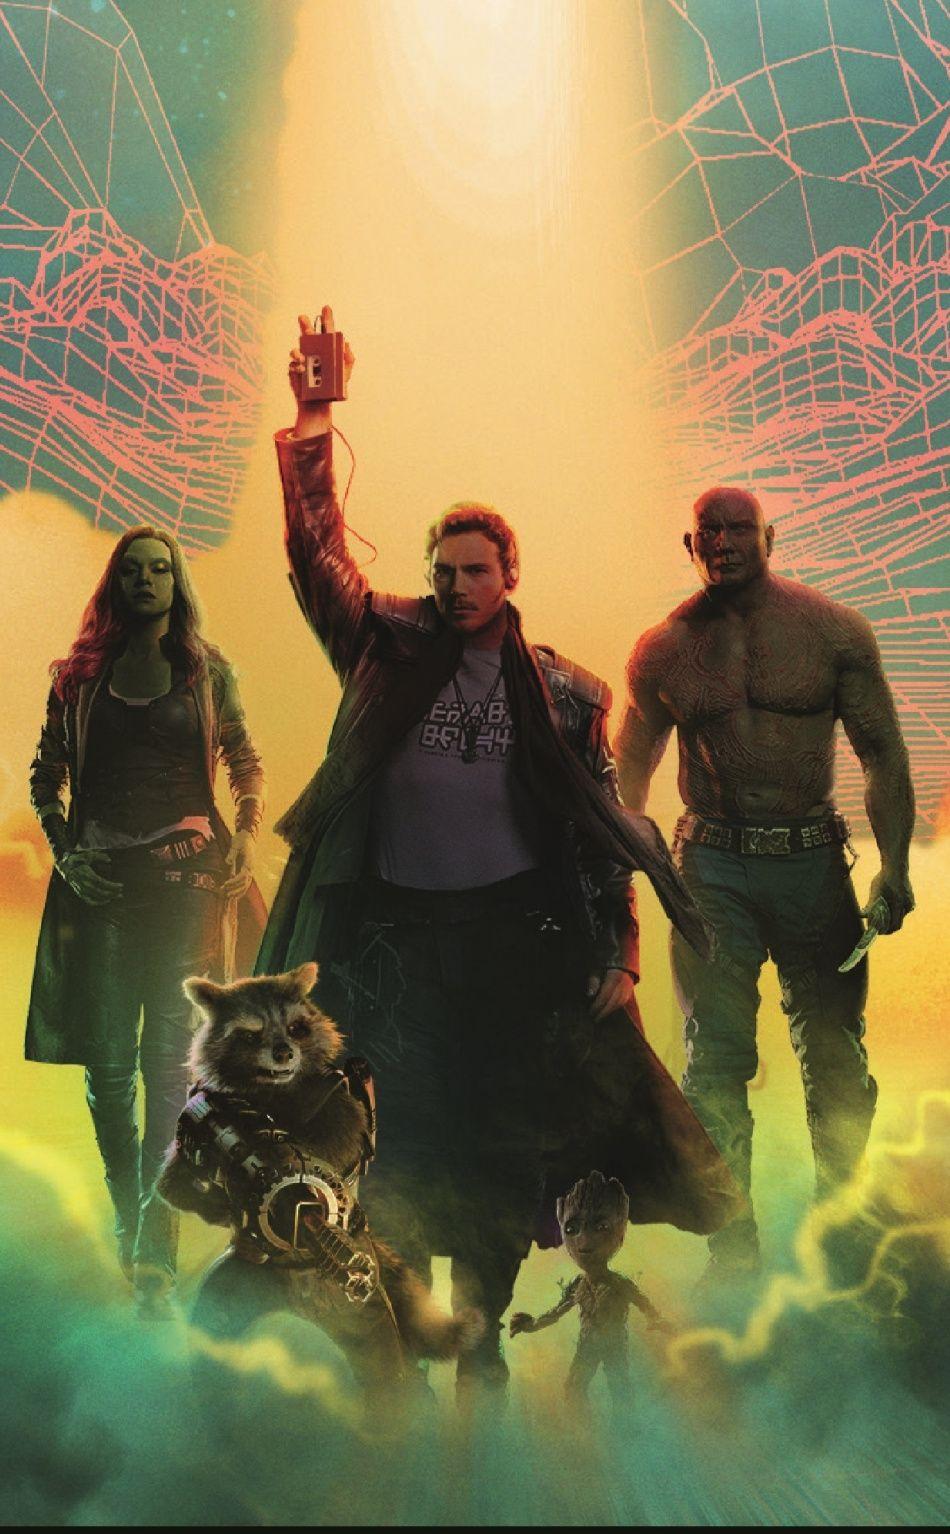 Guardians of the galaxy, superhero team, art, 950x1534 wallpaper